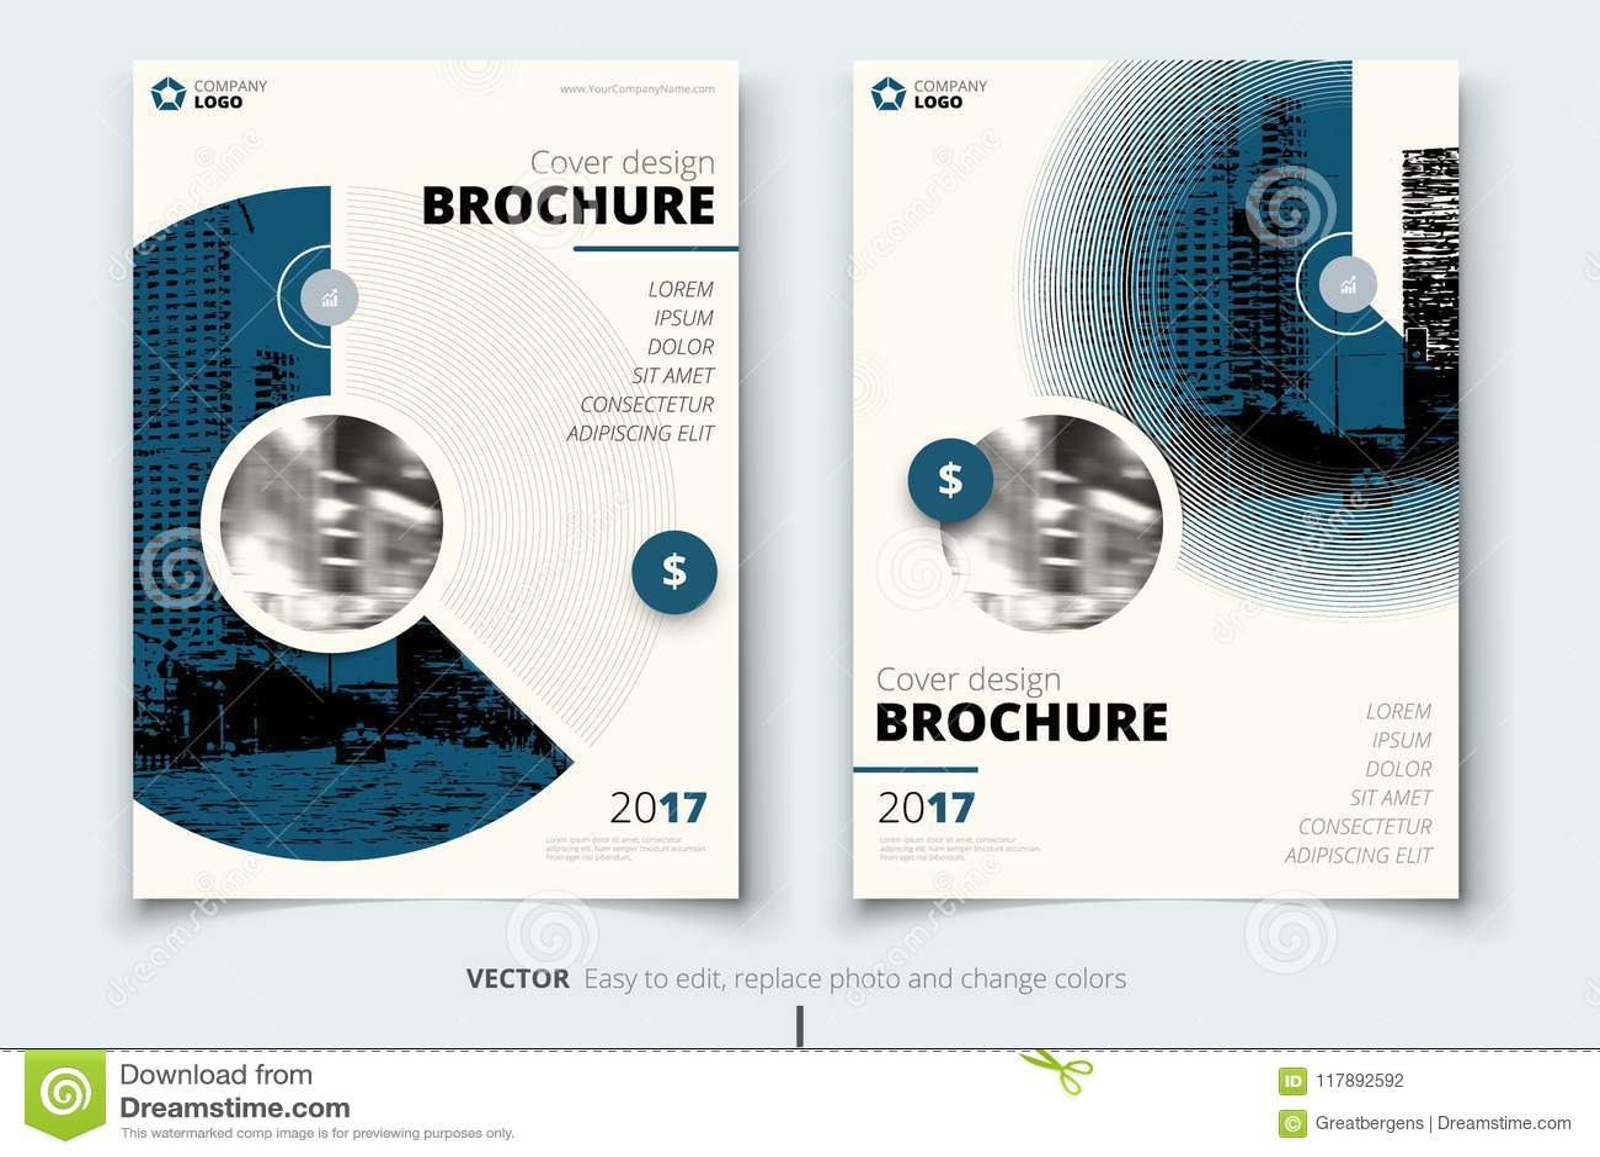 brochure design corporate business report cover brochure or flyer